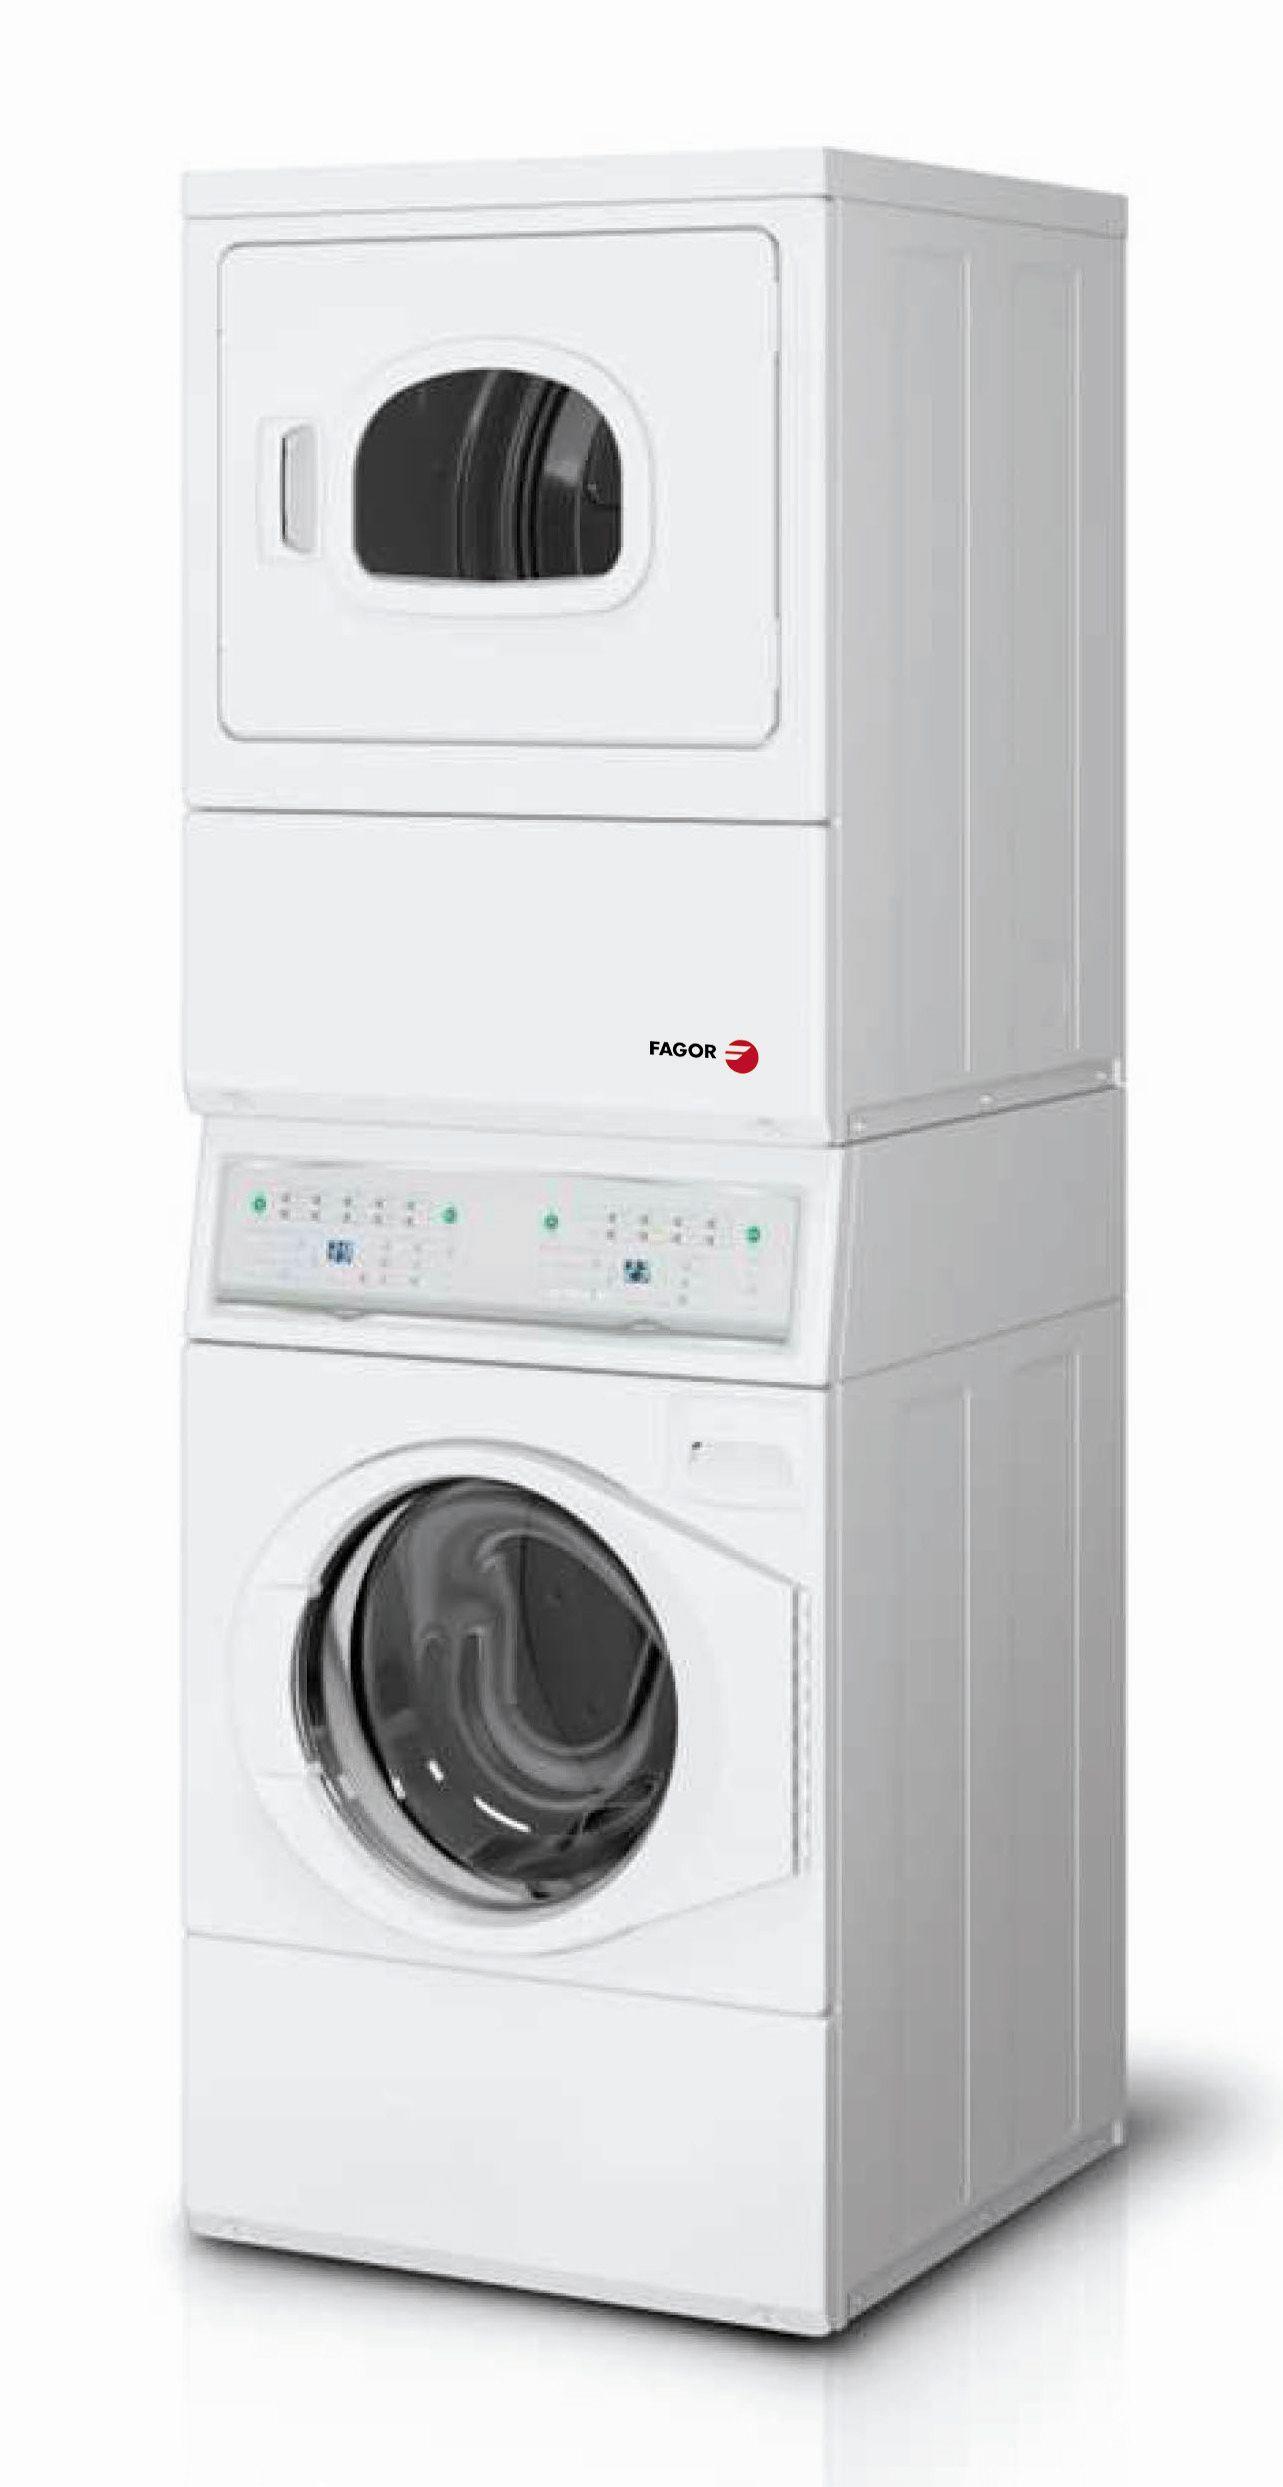 Ampliar imagen for Mueble para lavadora